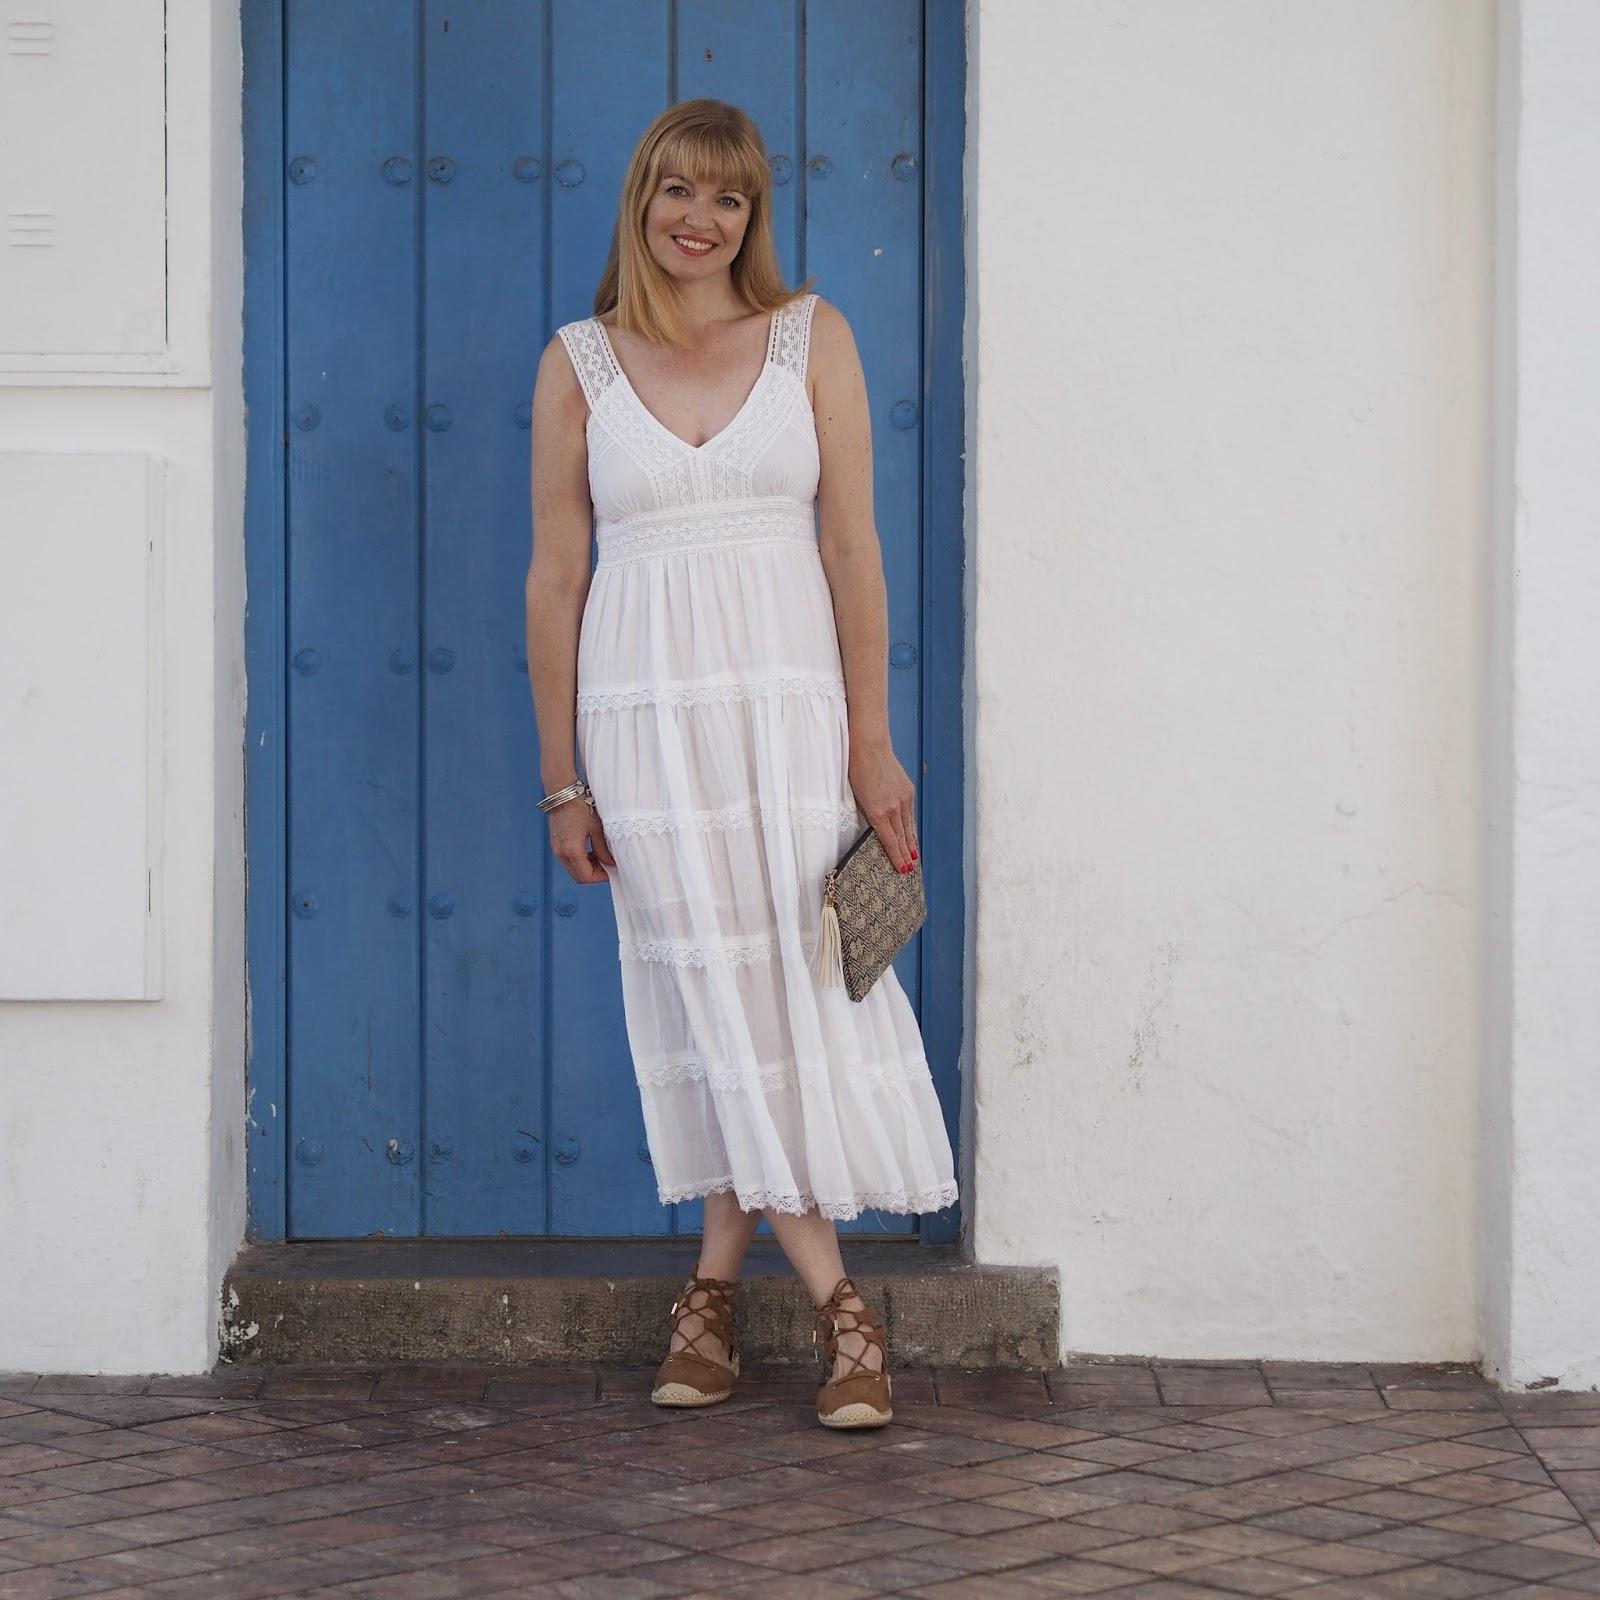 Nerja-packing-white-dress-espadrilles-blue-door